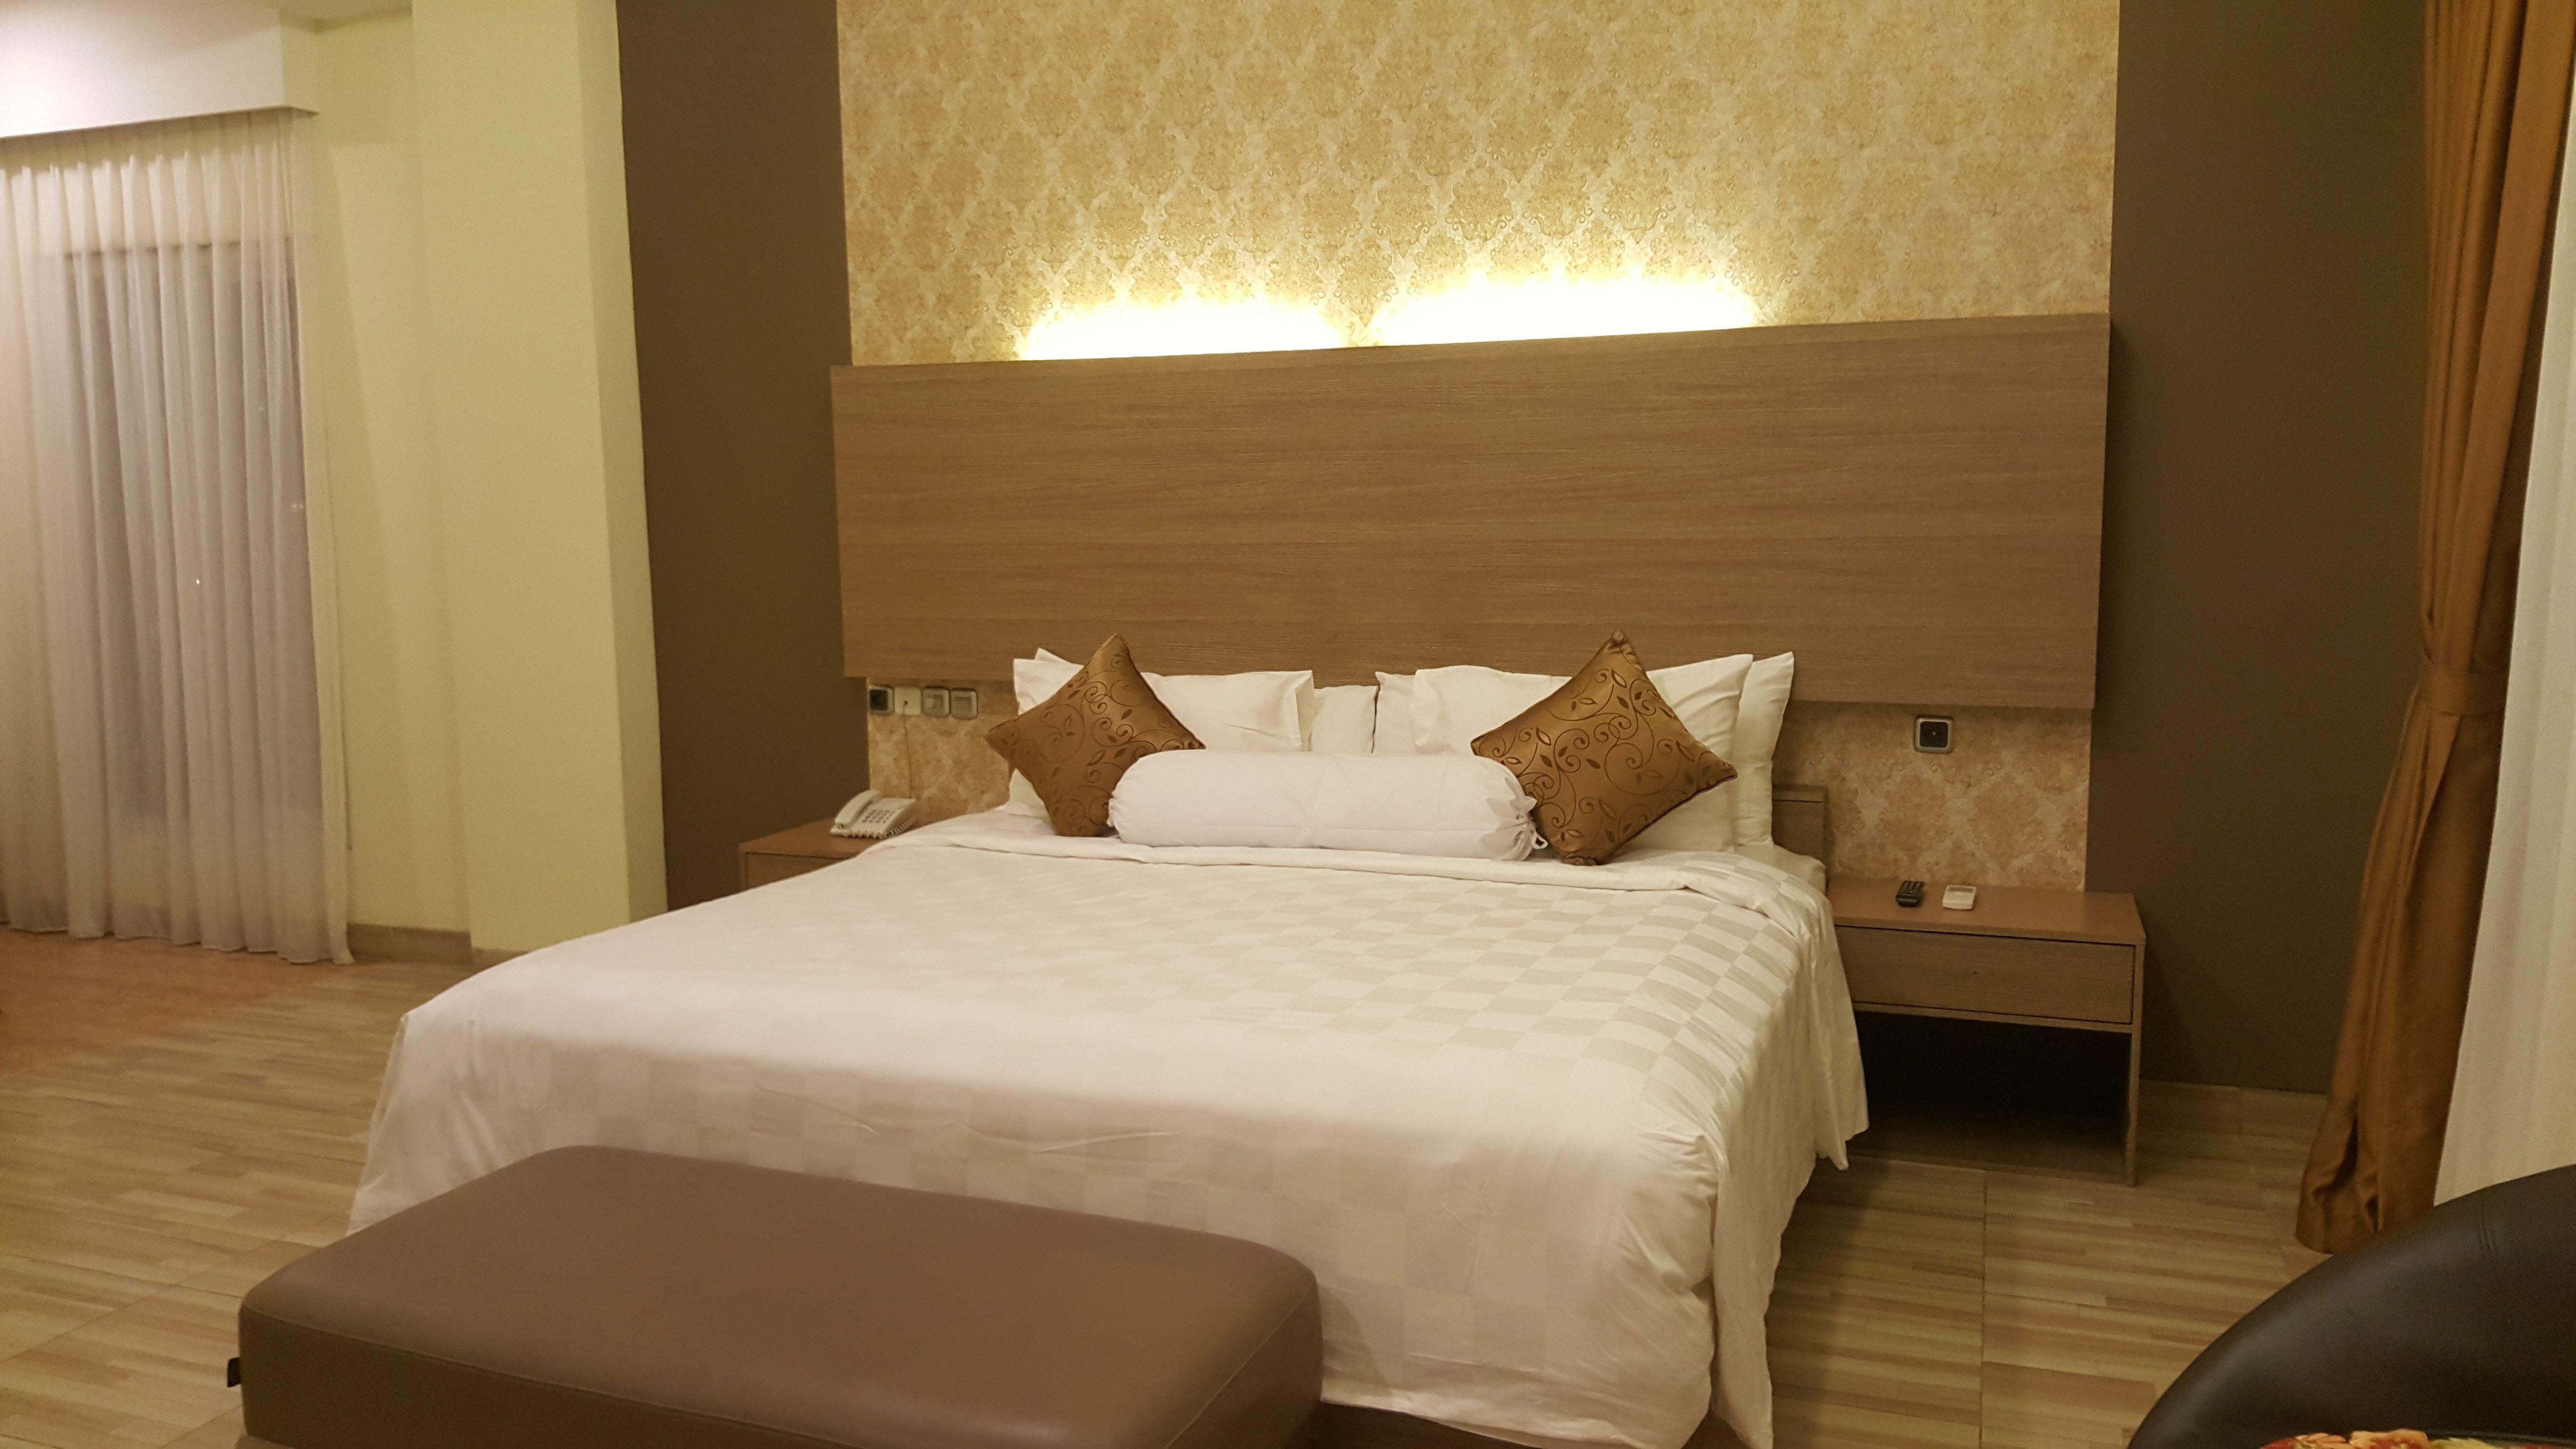 Muara Hotel & Mall Ternate,Ternate